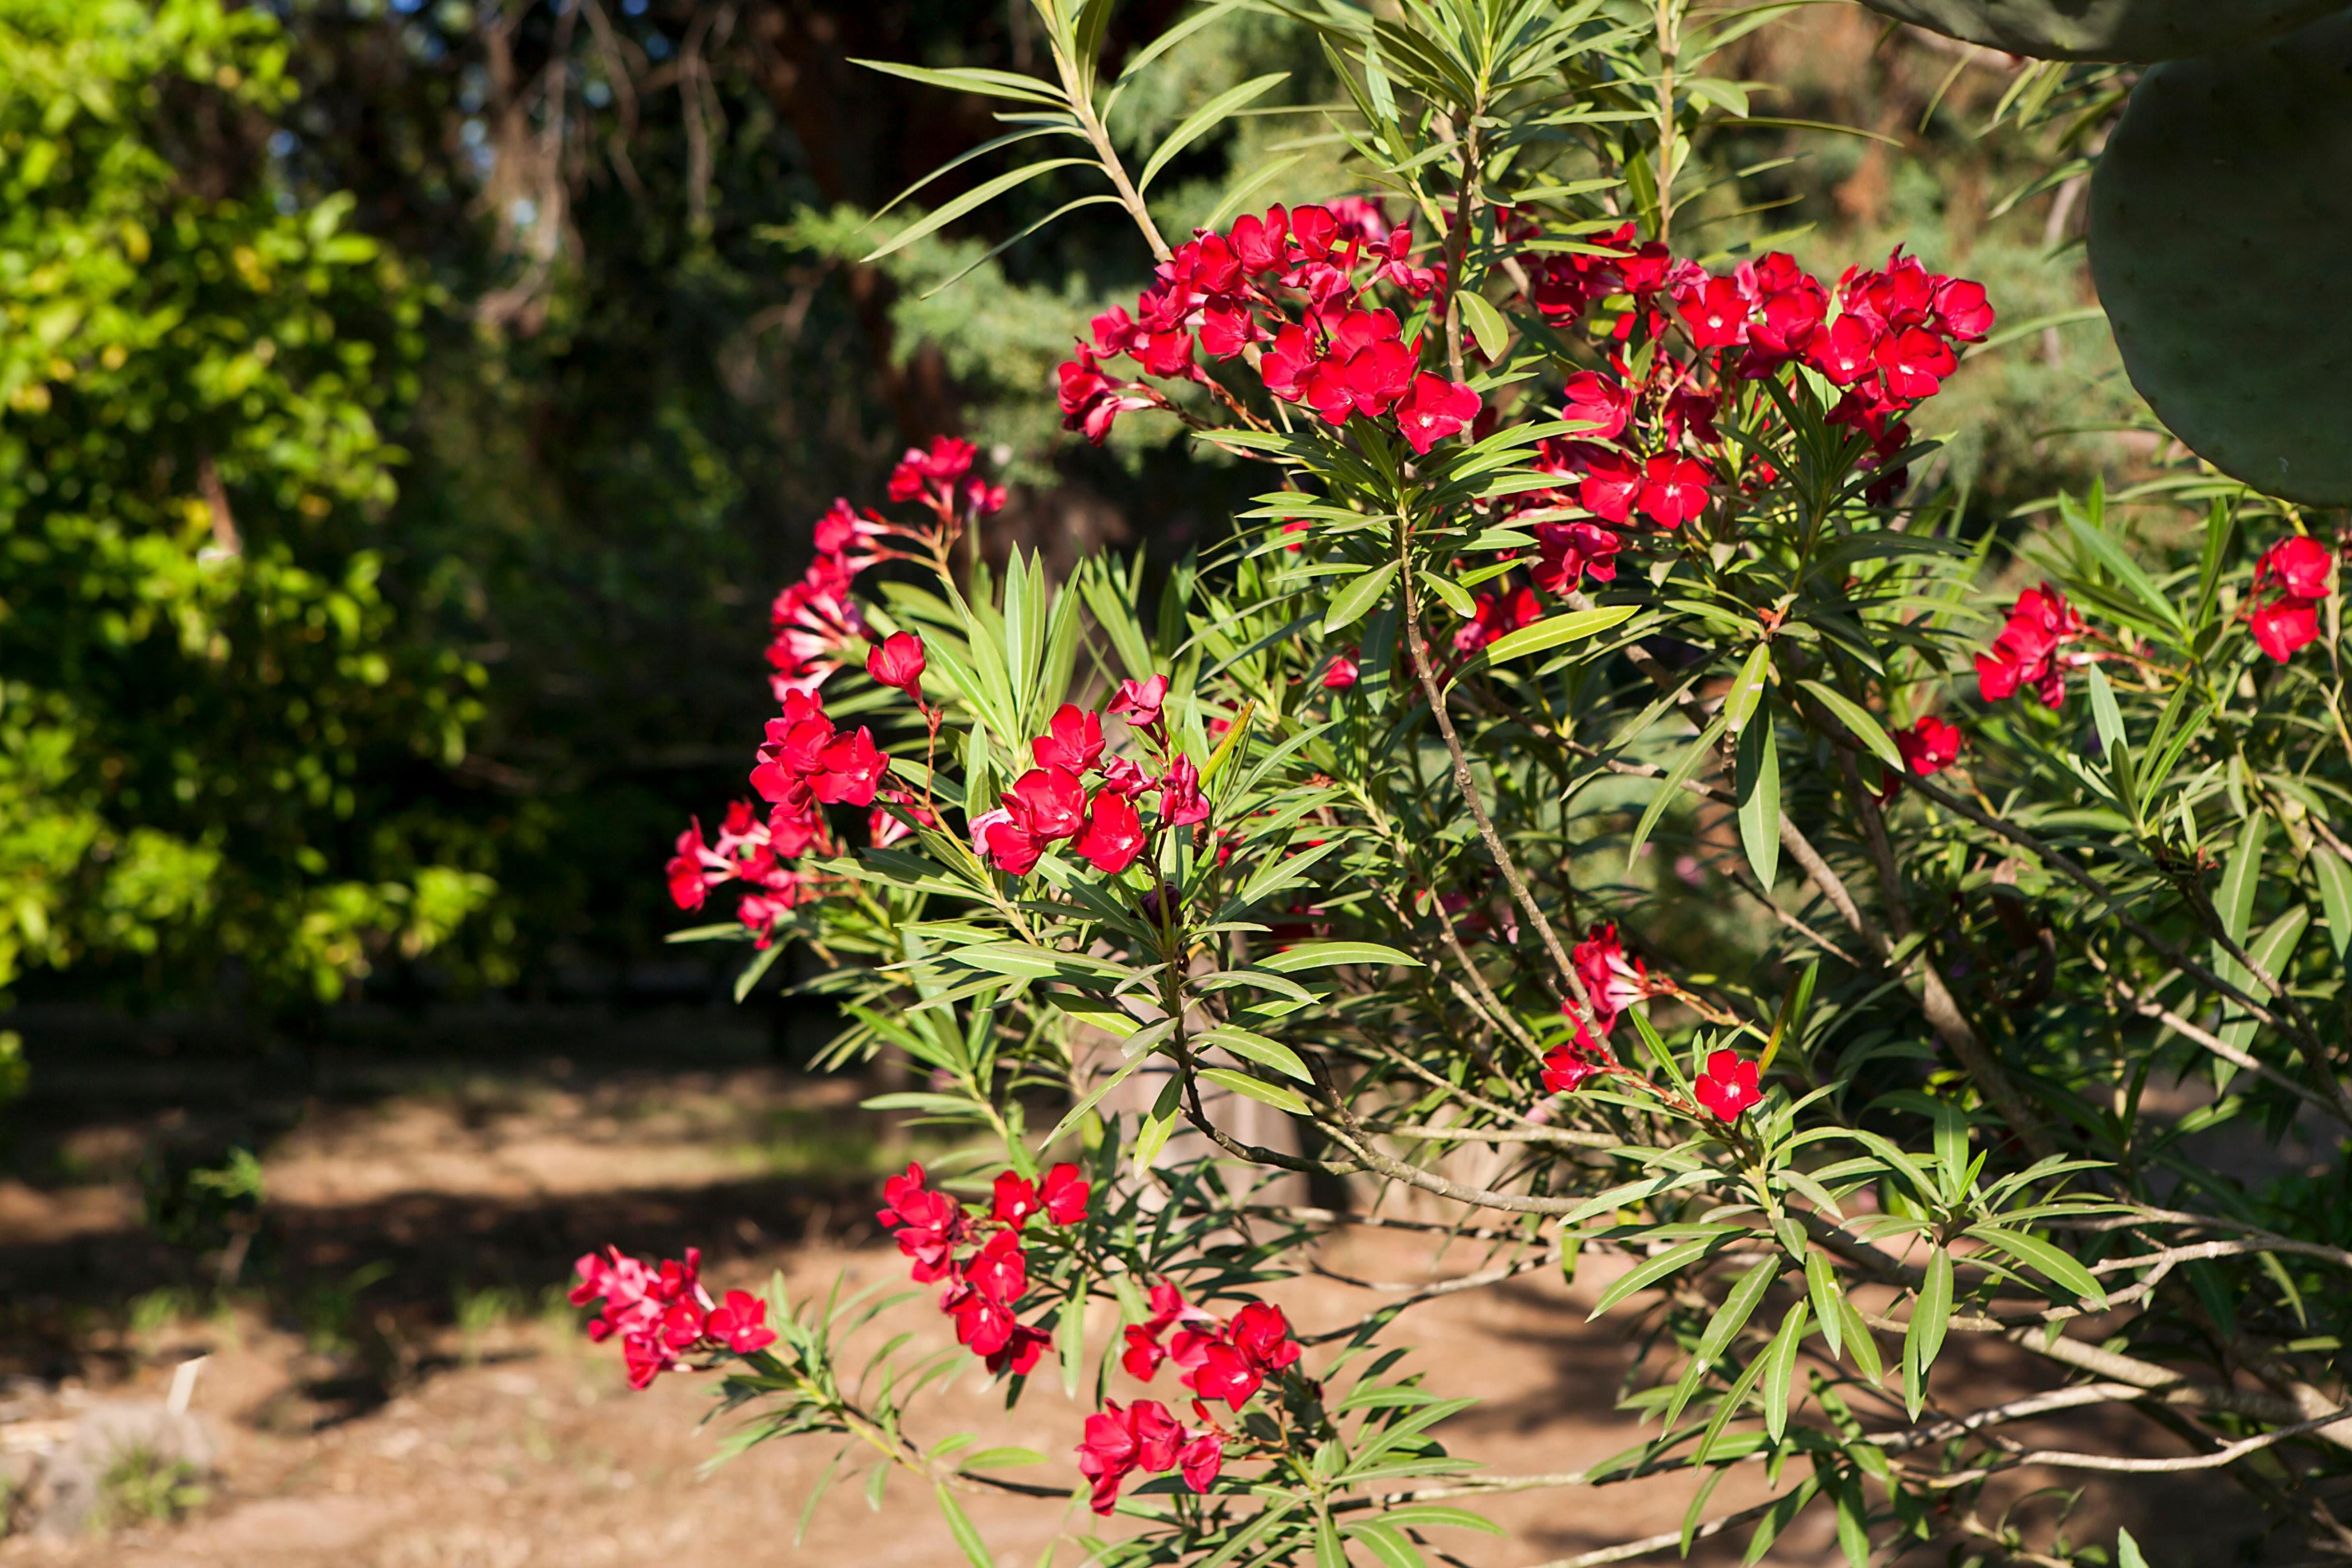 Oleander_czerwone kwiaty